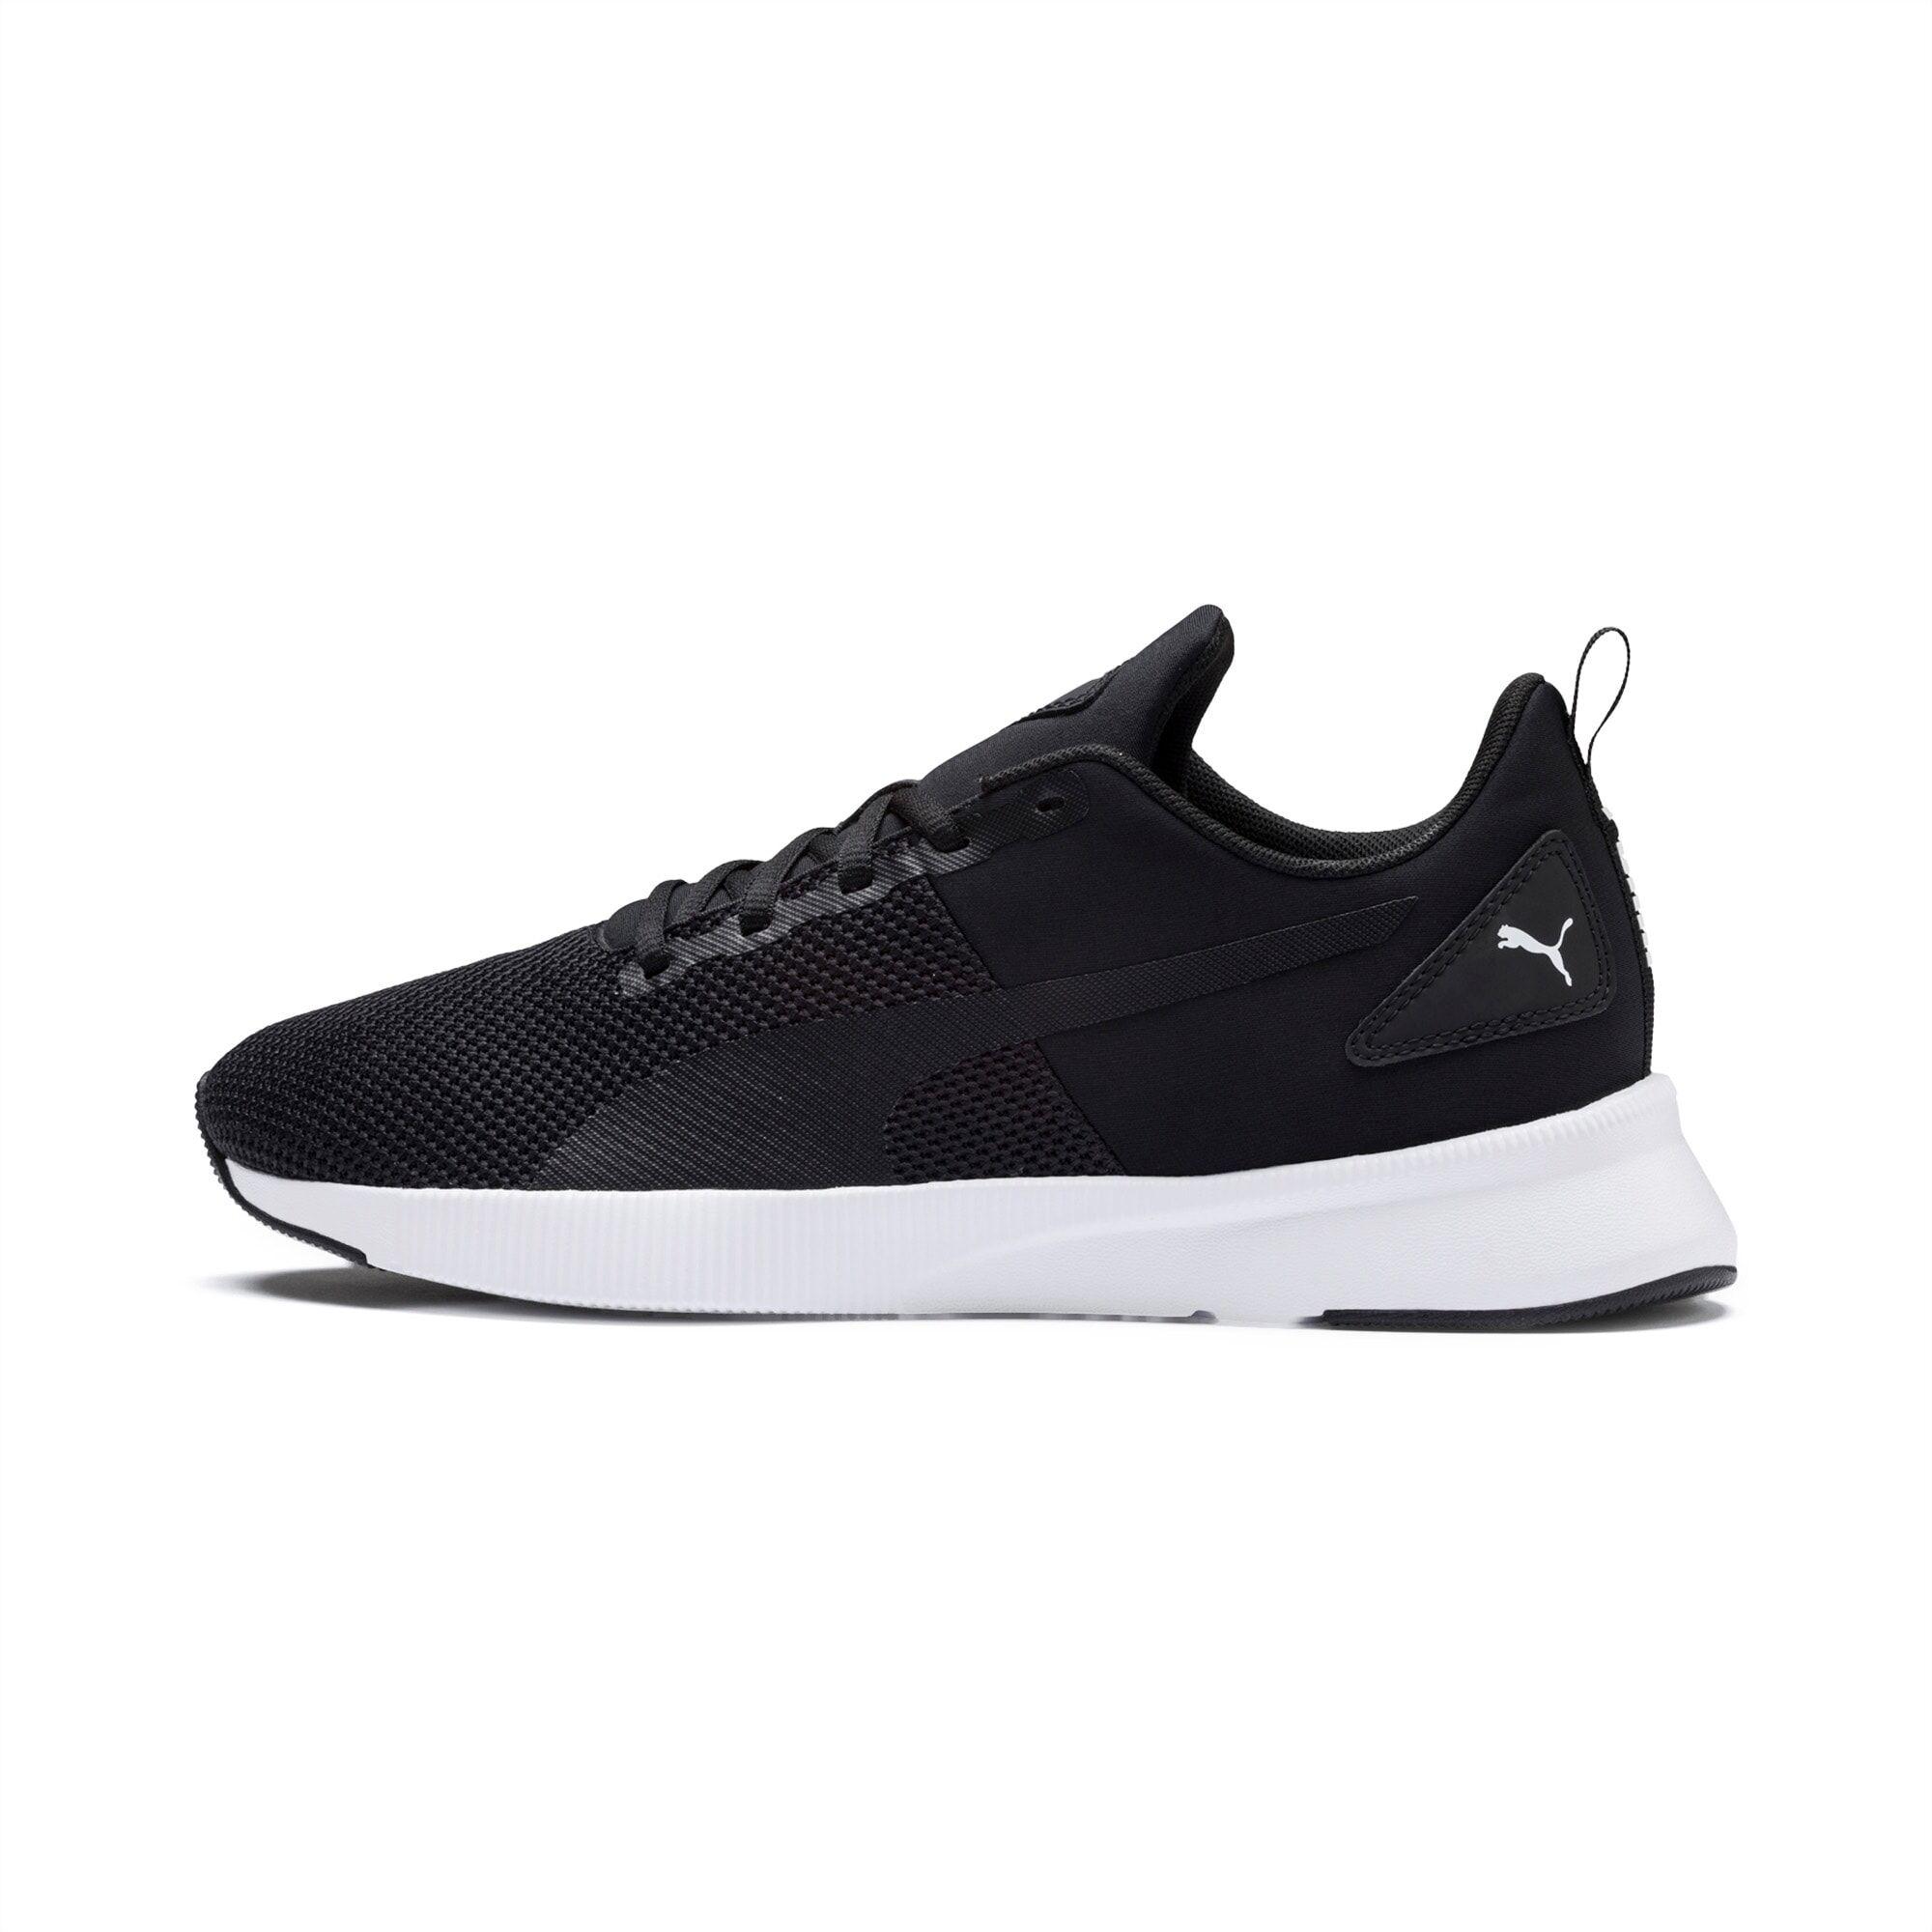 PUMA Chaussure de course Flyer Runner, Noir/Blanc, Taille 44.5, Chaussures